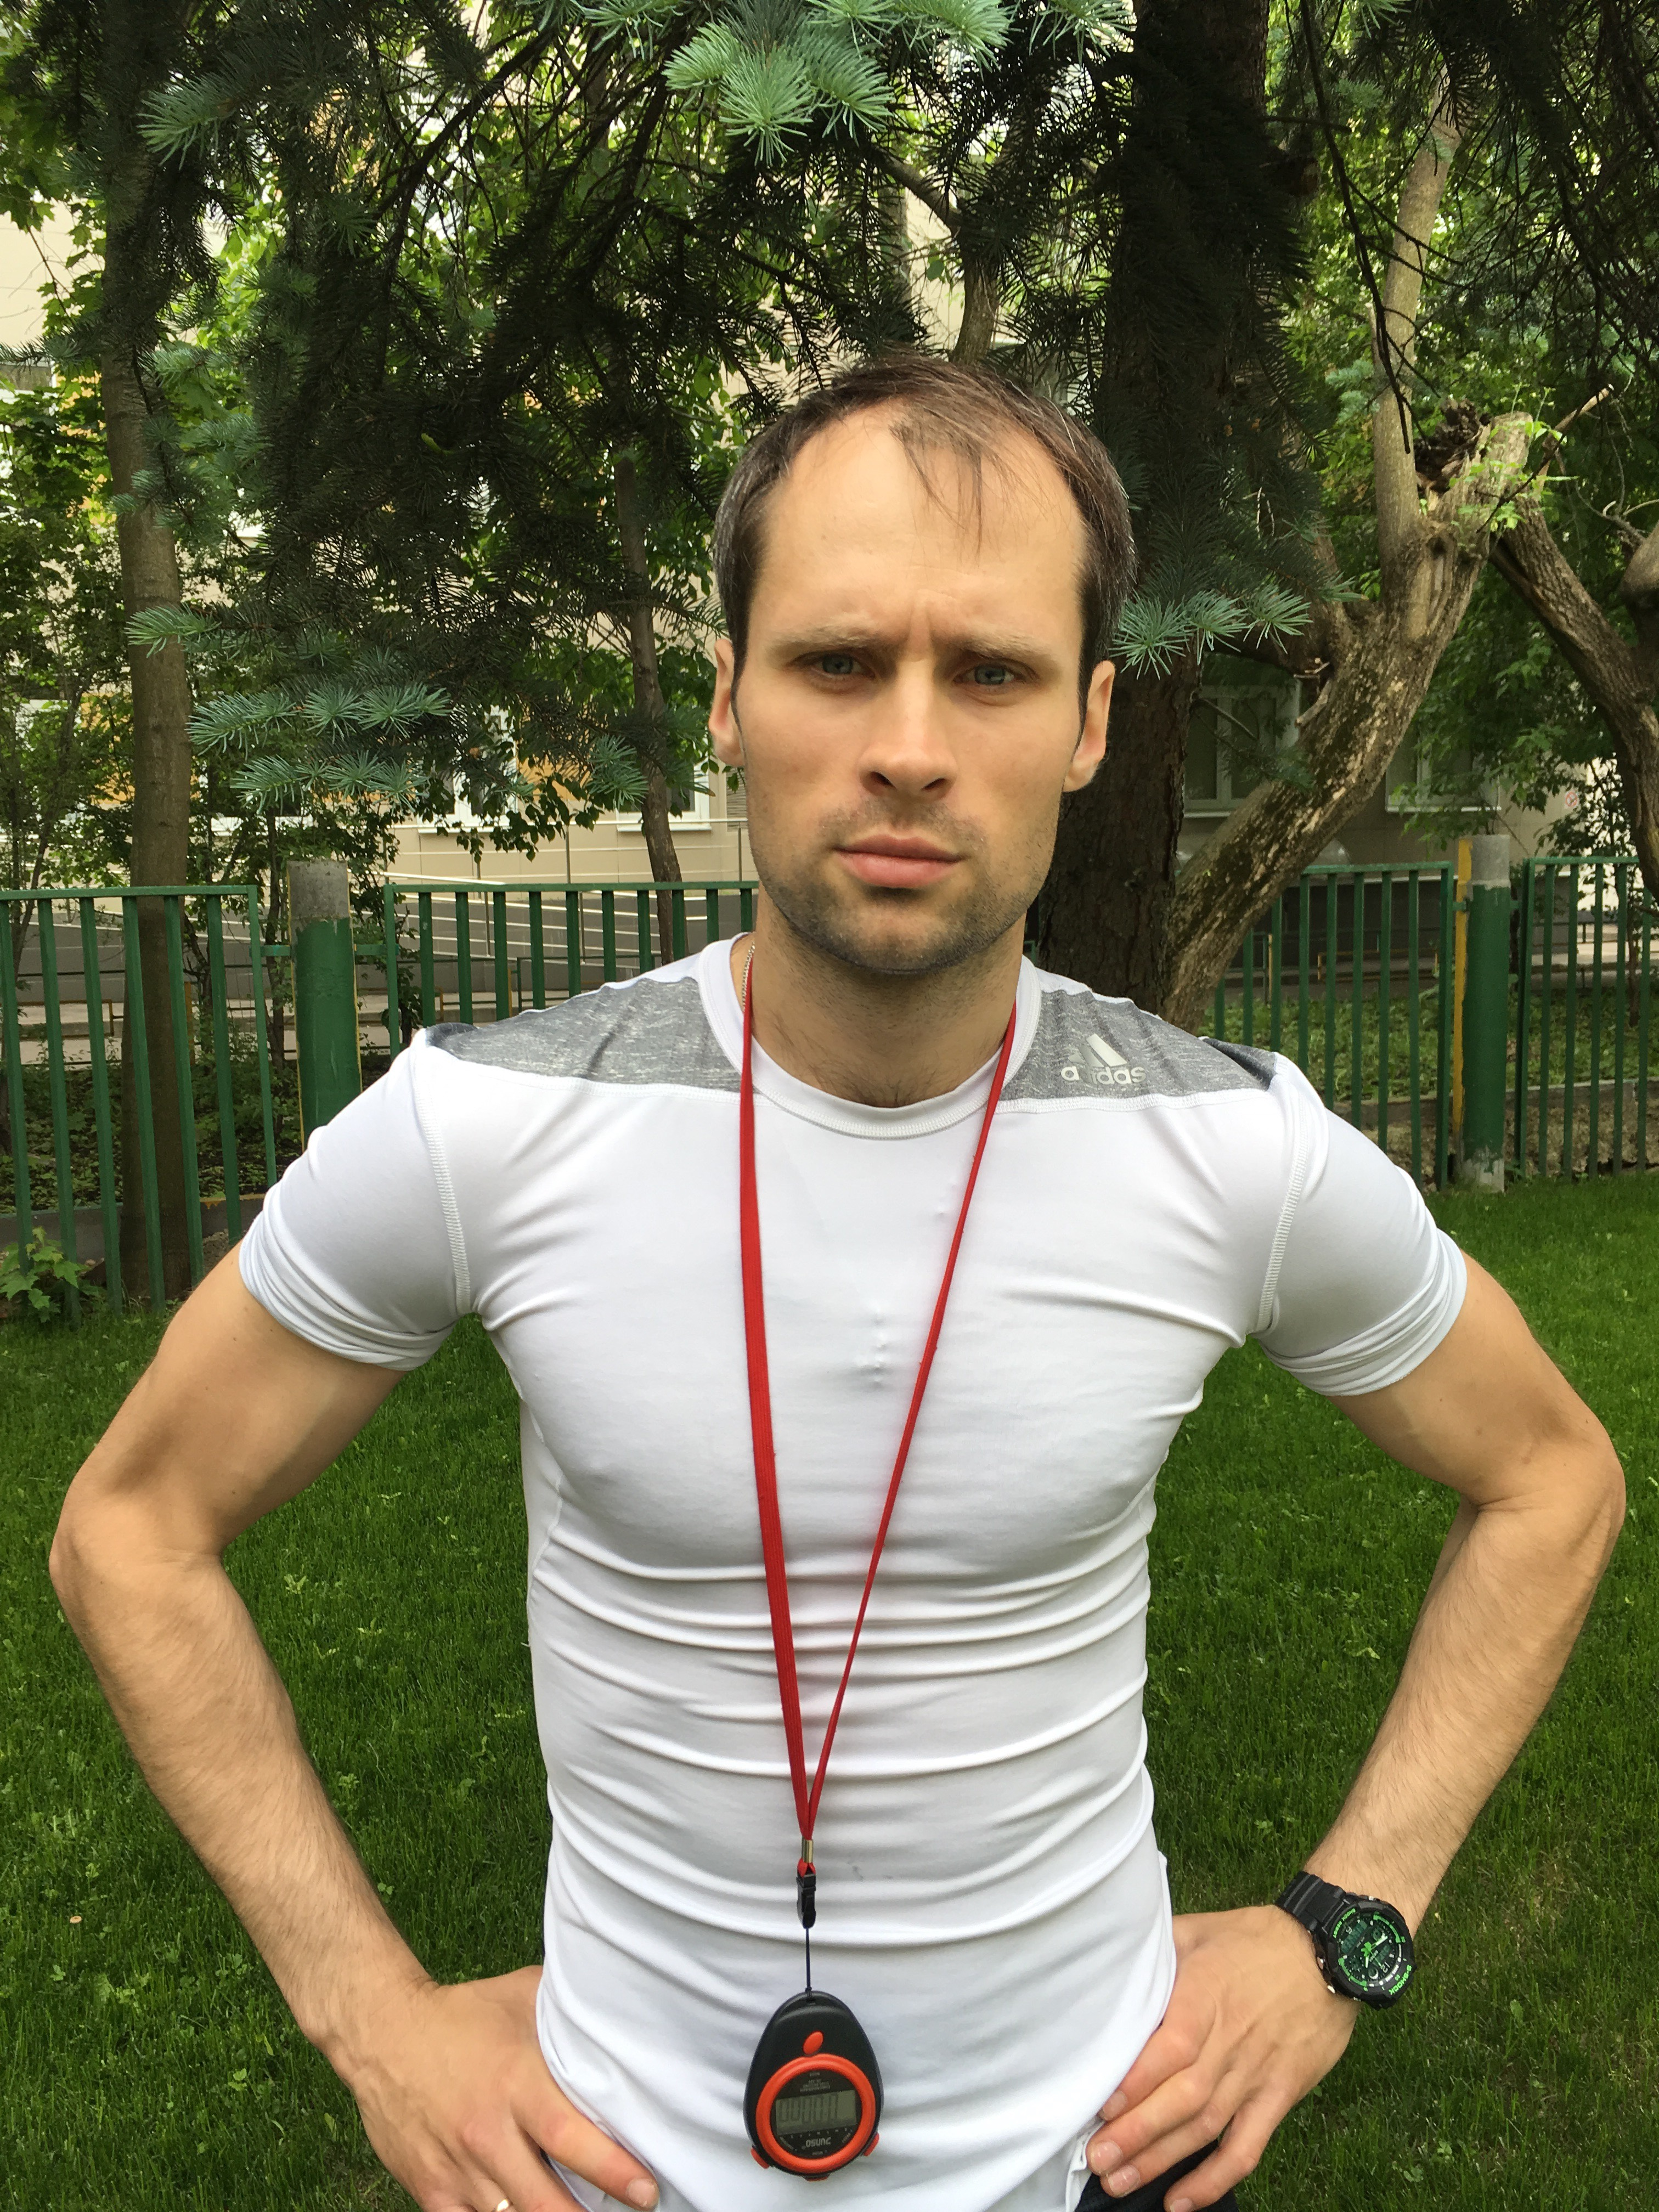 Терентьев Антон Андреевич